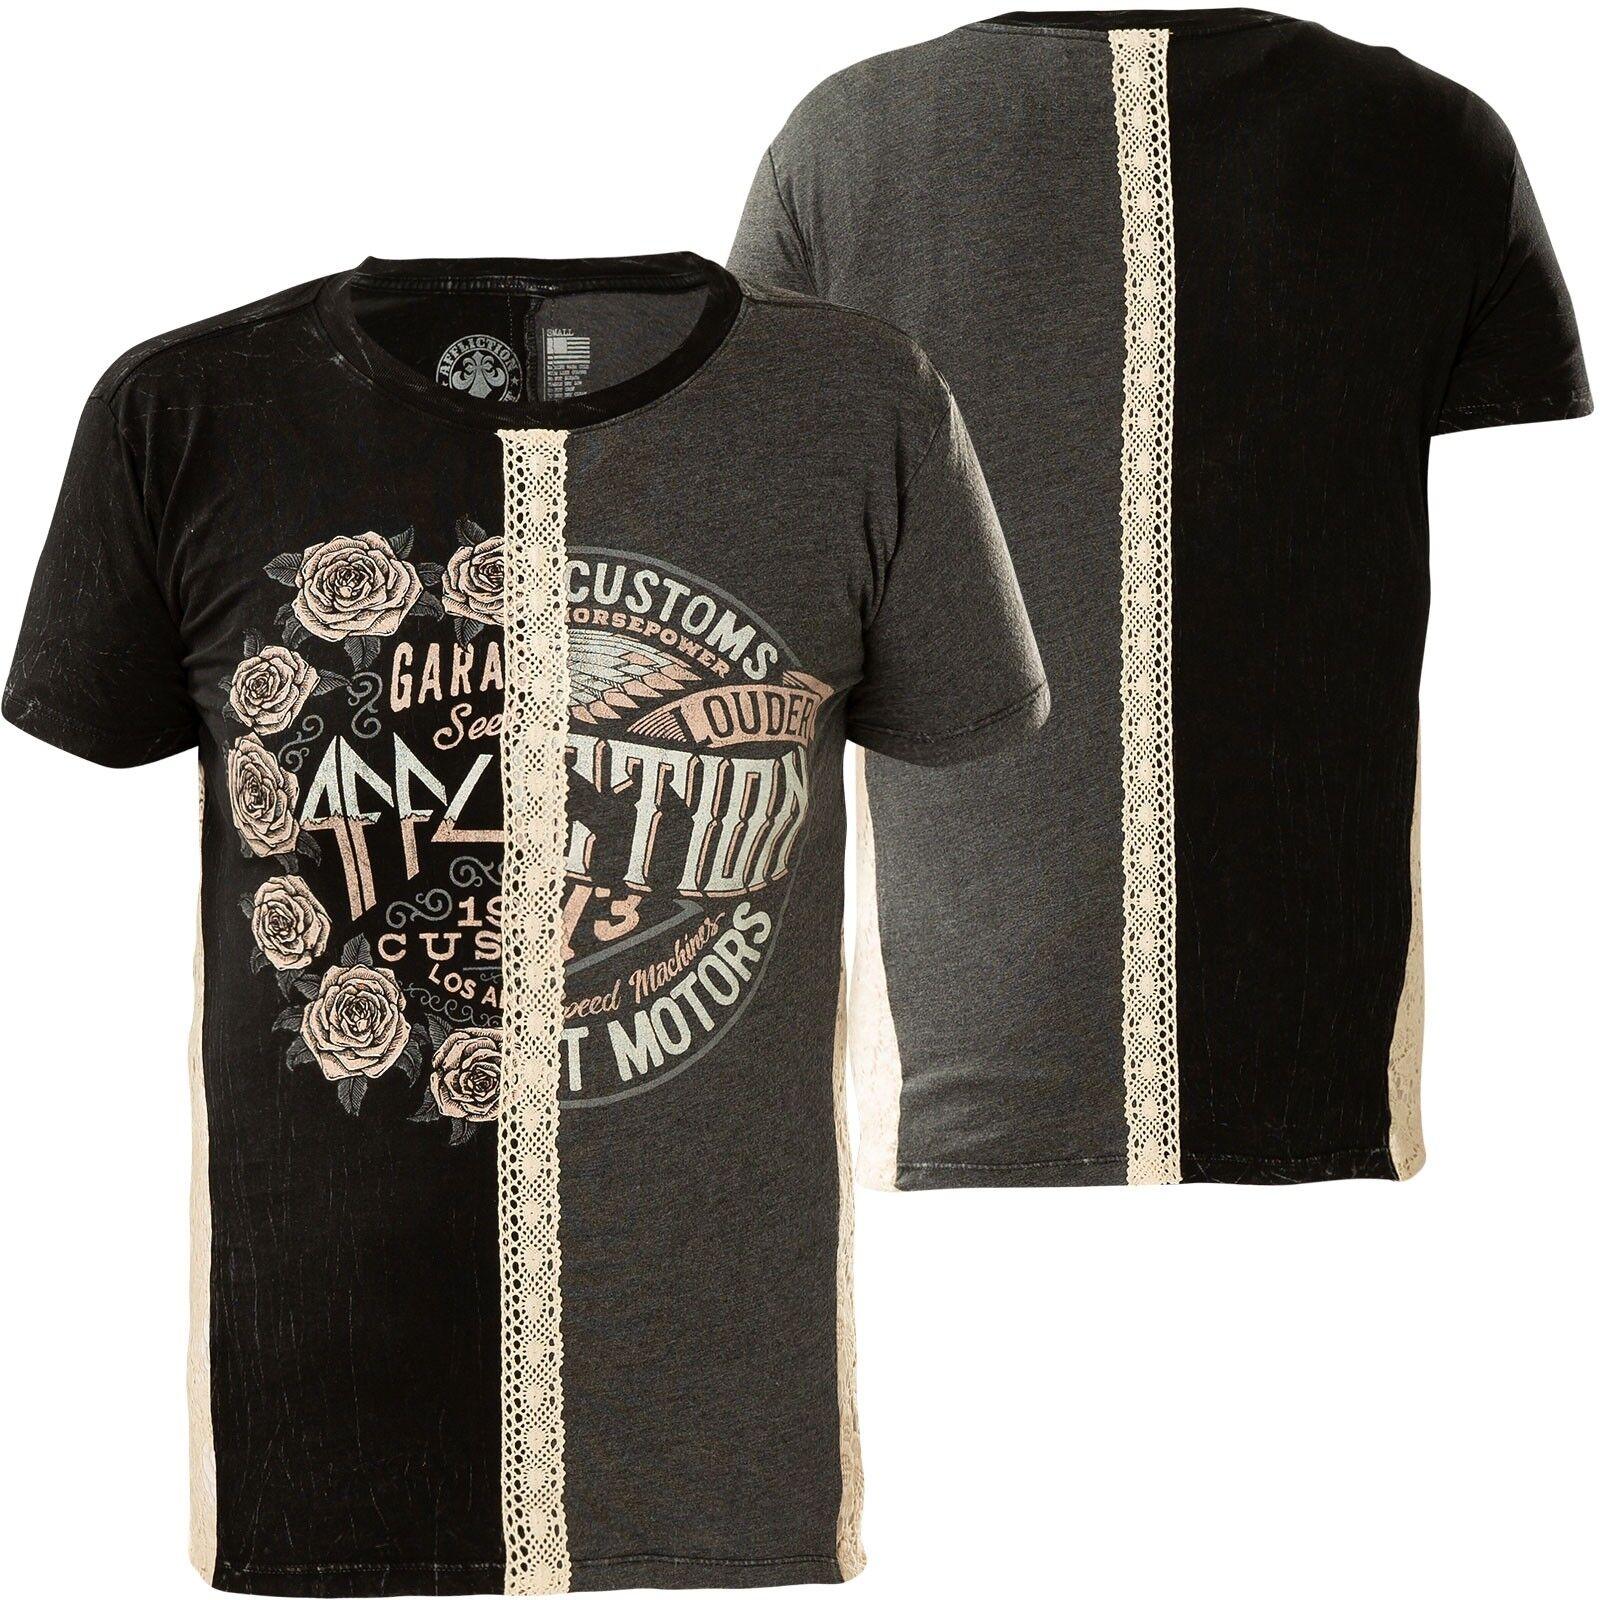 AFFLICTION Damen T-Shirt Heartache Split Schwarz Grau